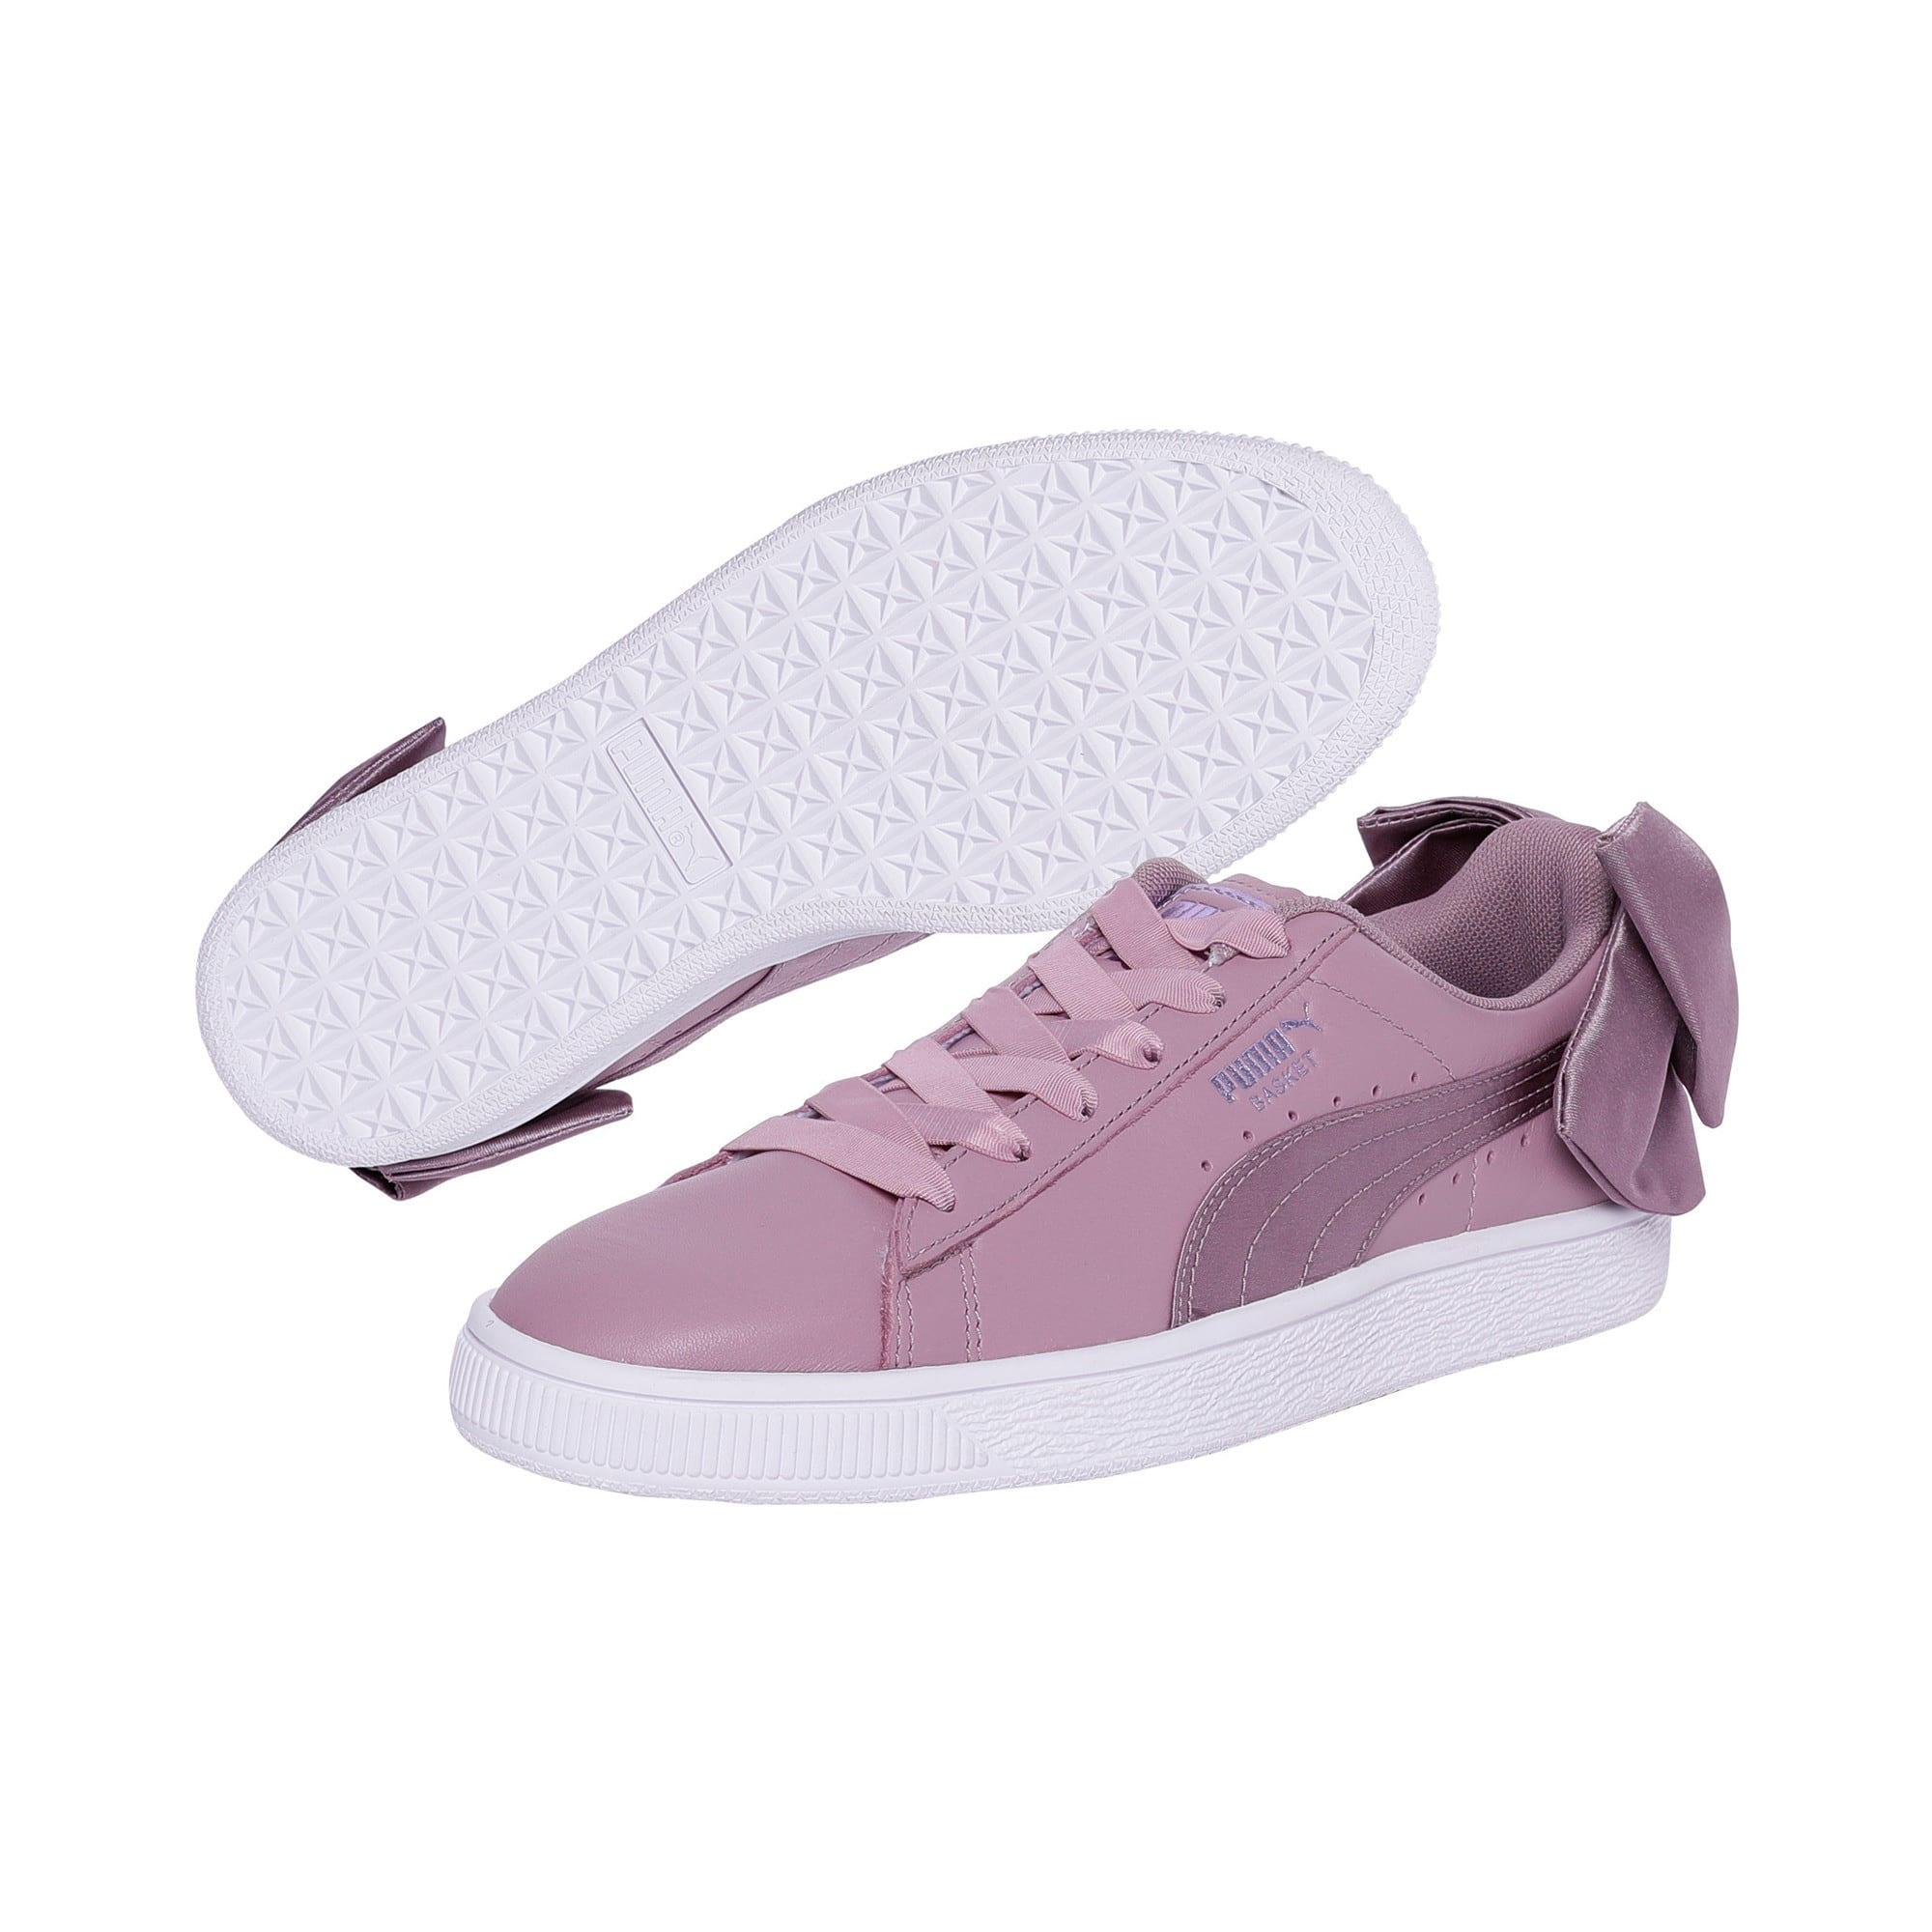 Thumbnail 2 of Basket Women's Bow Satin Sneakers, Elderberry-Puma White, medium-IND